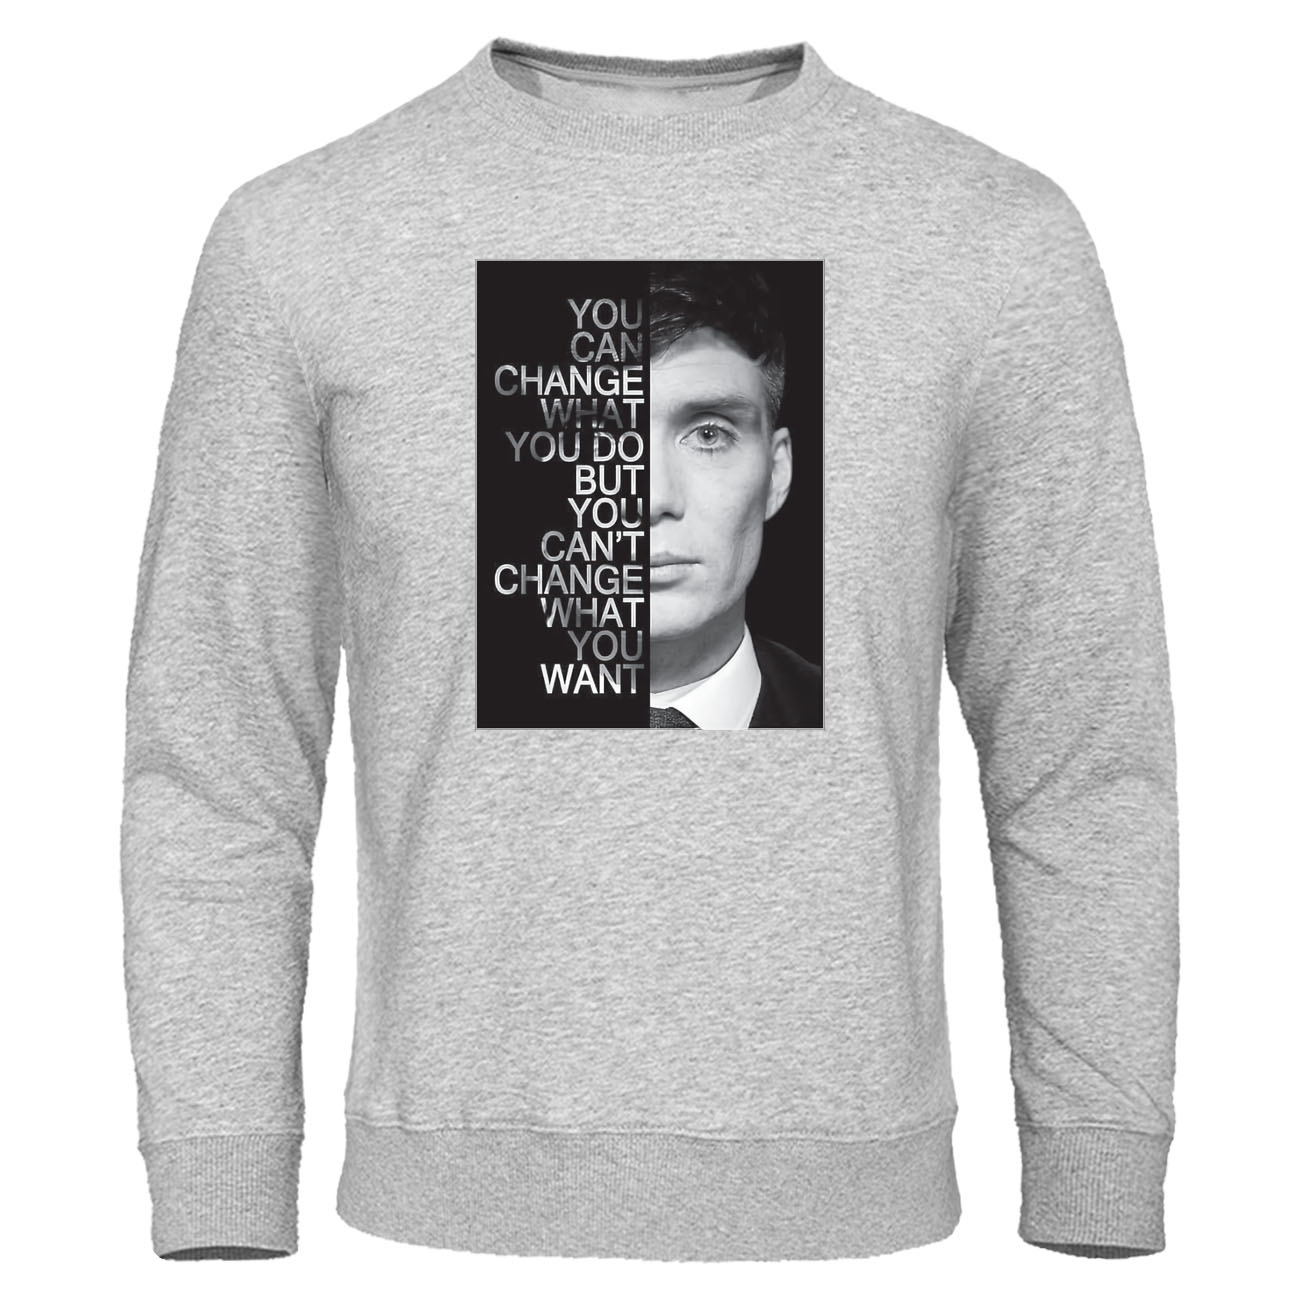 Peaky Blinders TV Show Sweatshirt Men Printed Funny Sweatshirts Mens Gangster Family Streetwear Hip Hop Autumn Winter Clothes